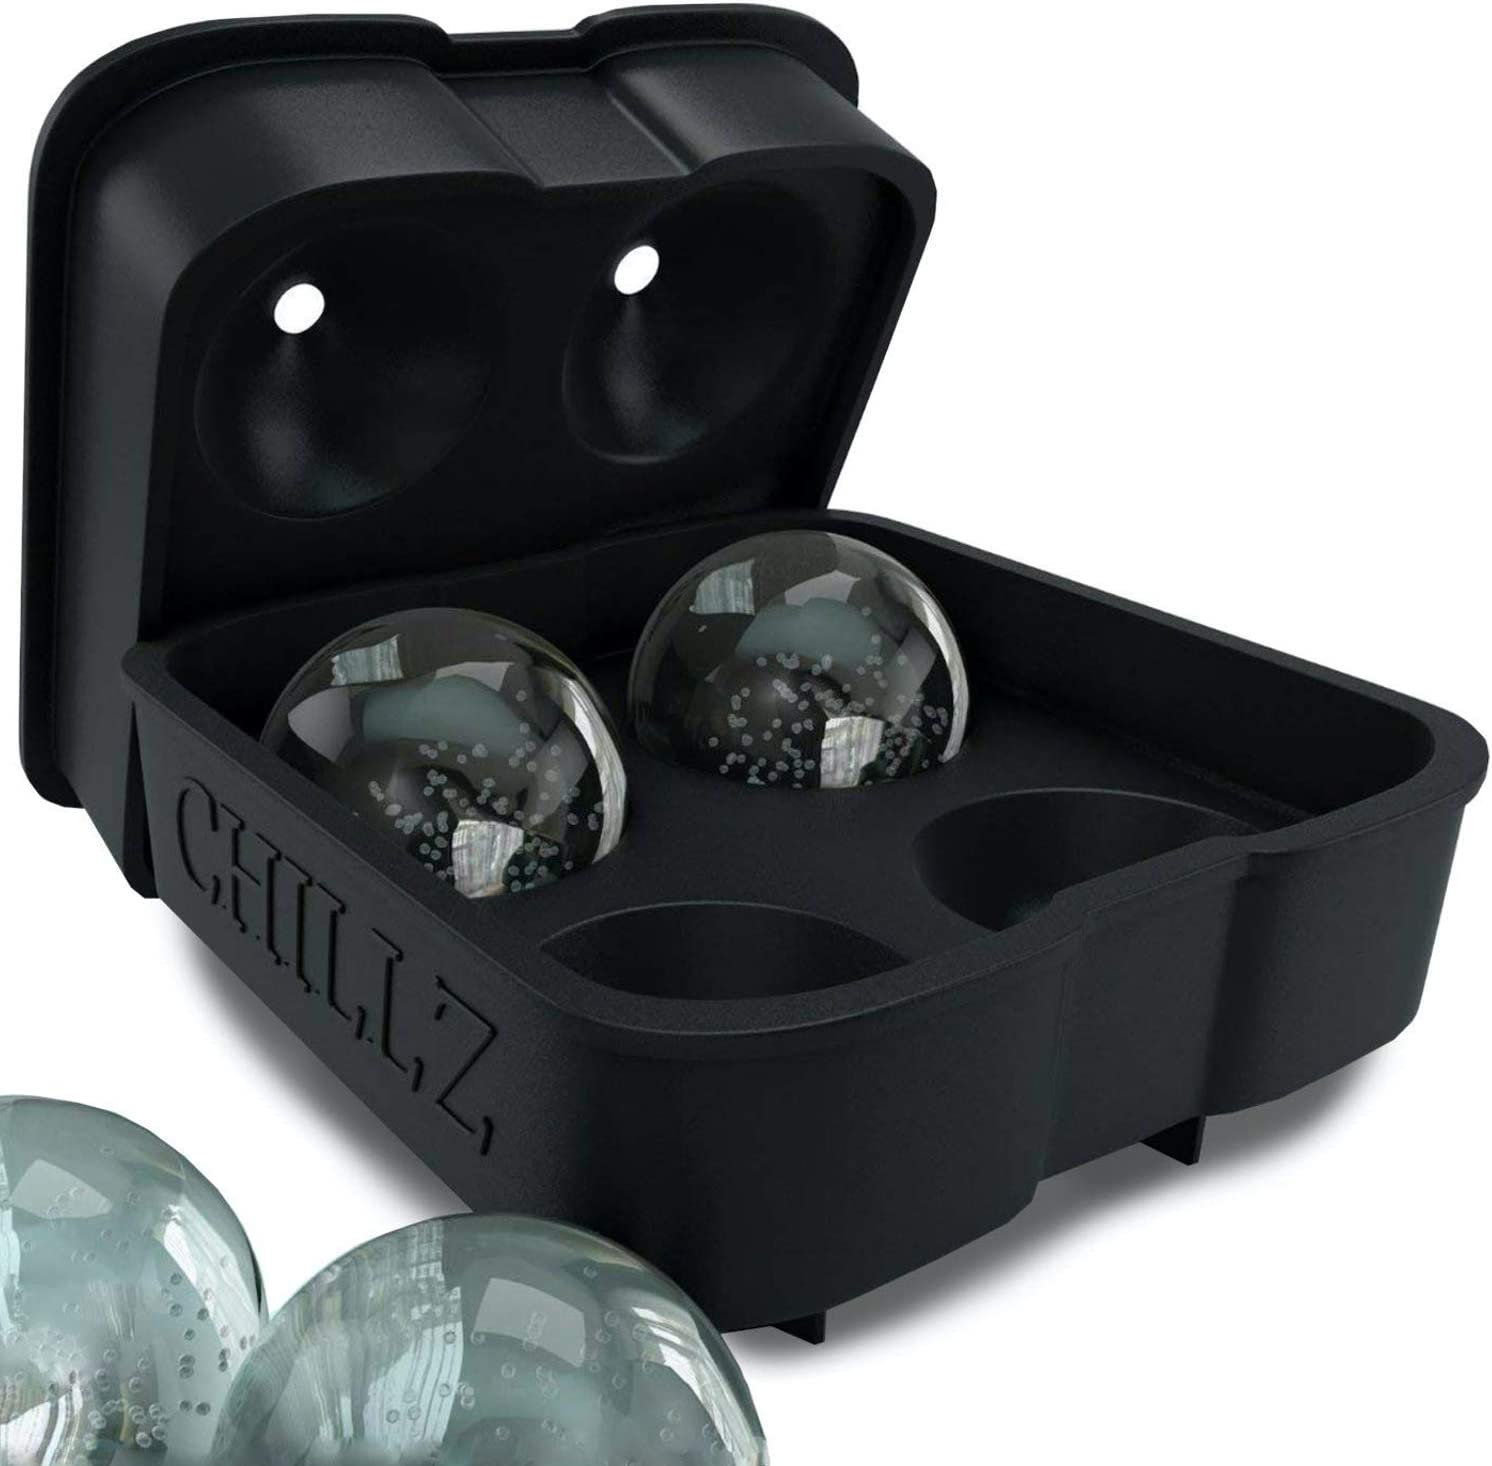 10-cavity Bullet Ice Tray Ice Mold Flexible Silicone Mold Handmade DIY Mold